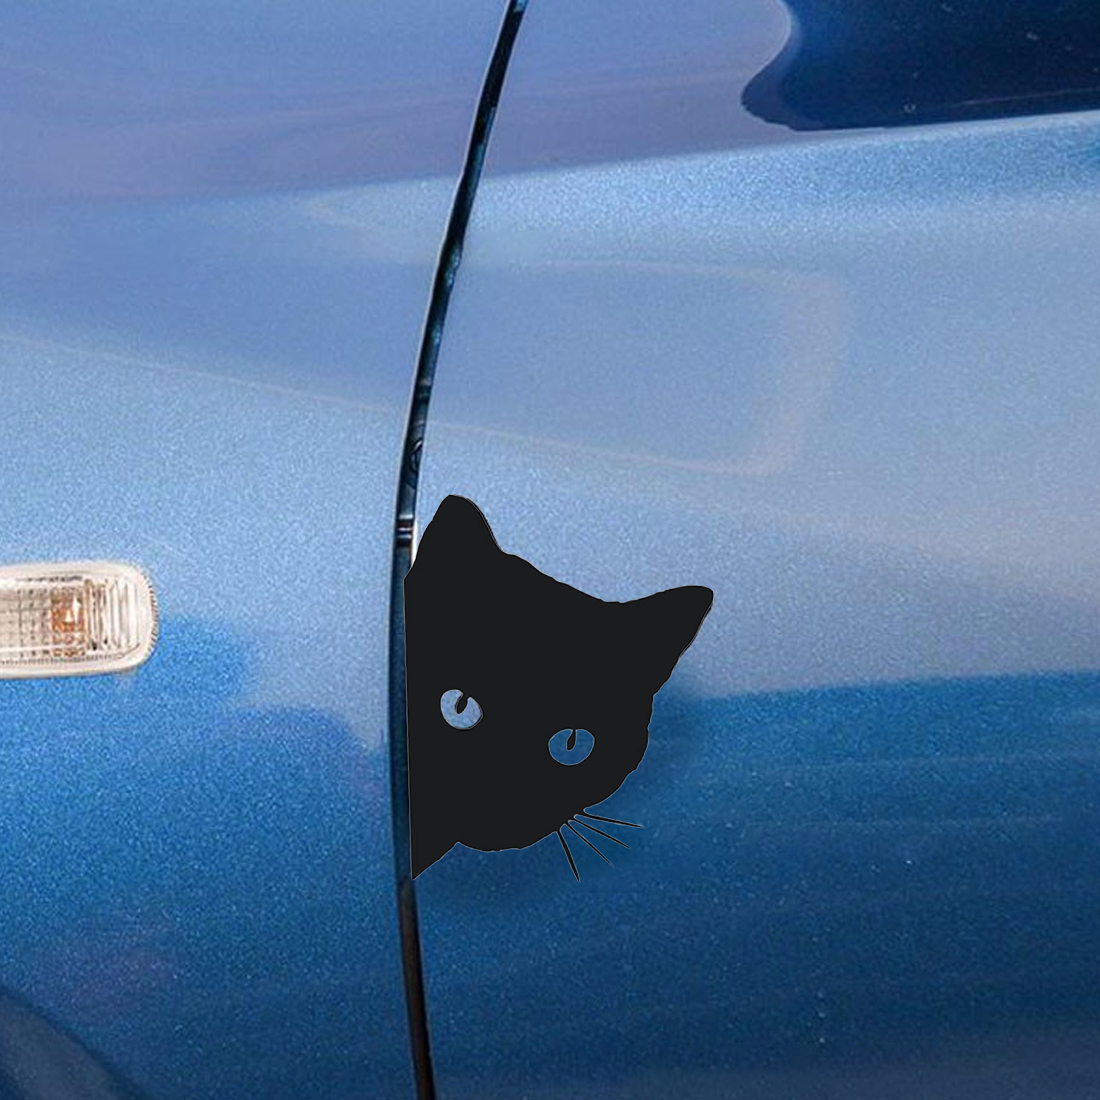 Dewtreetali 12*15CM CAT FACE PEERING Car Sticker Decals Pet Cat Motorcycle Decorative Stickers Car Window Decals стоимость